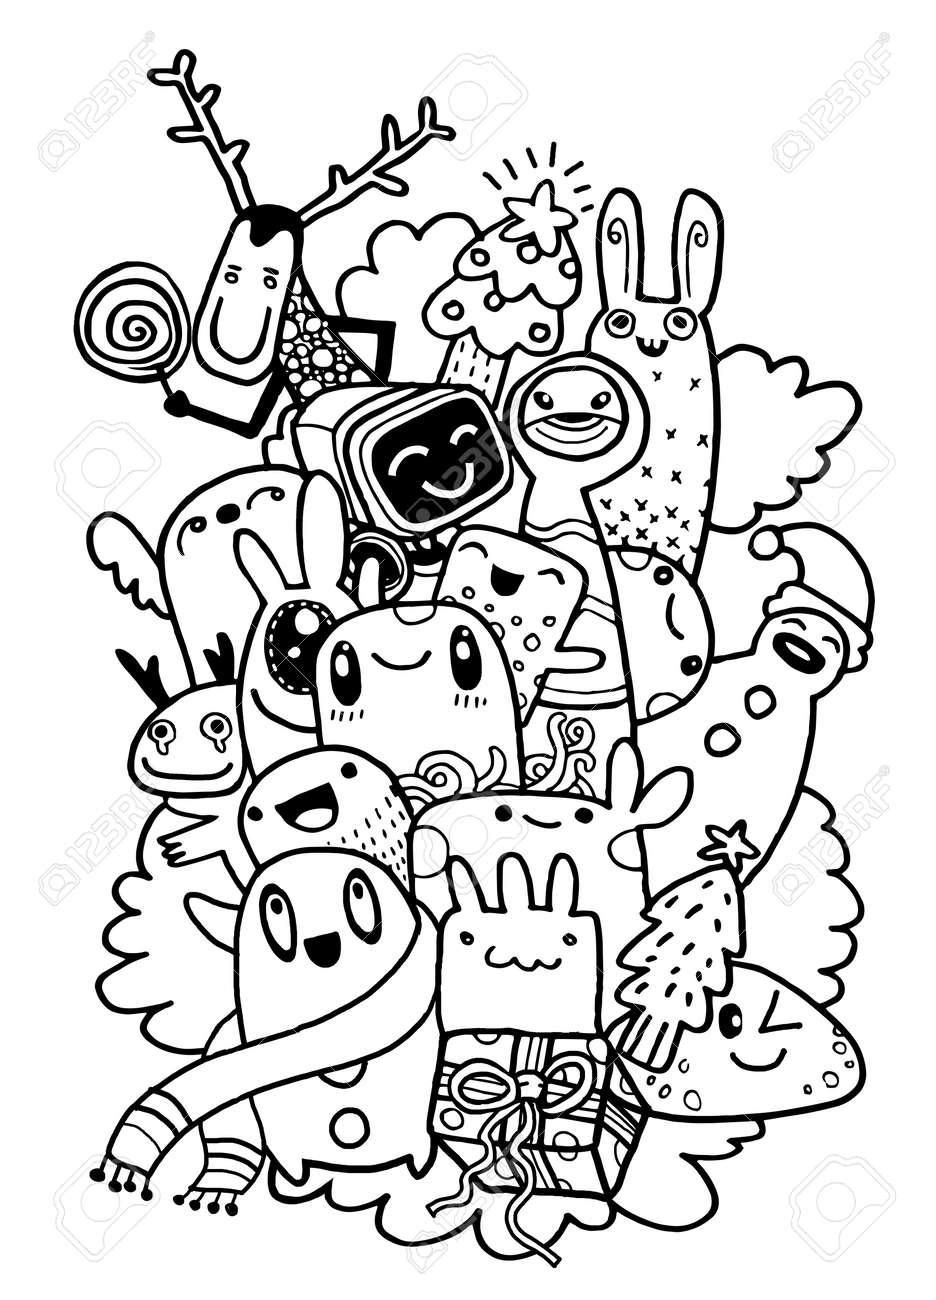 Hand drawing cartoon character,Merry Christmas  Doodles vector